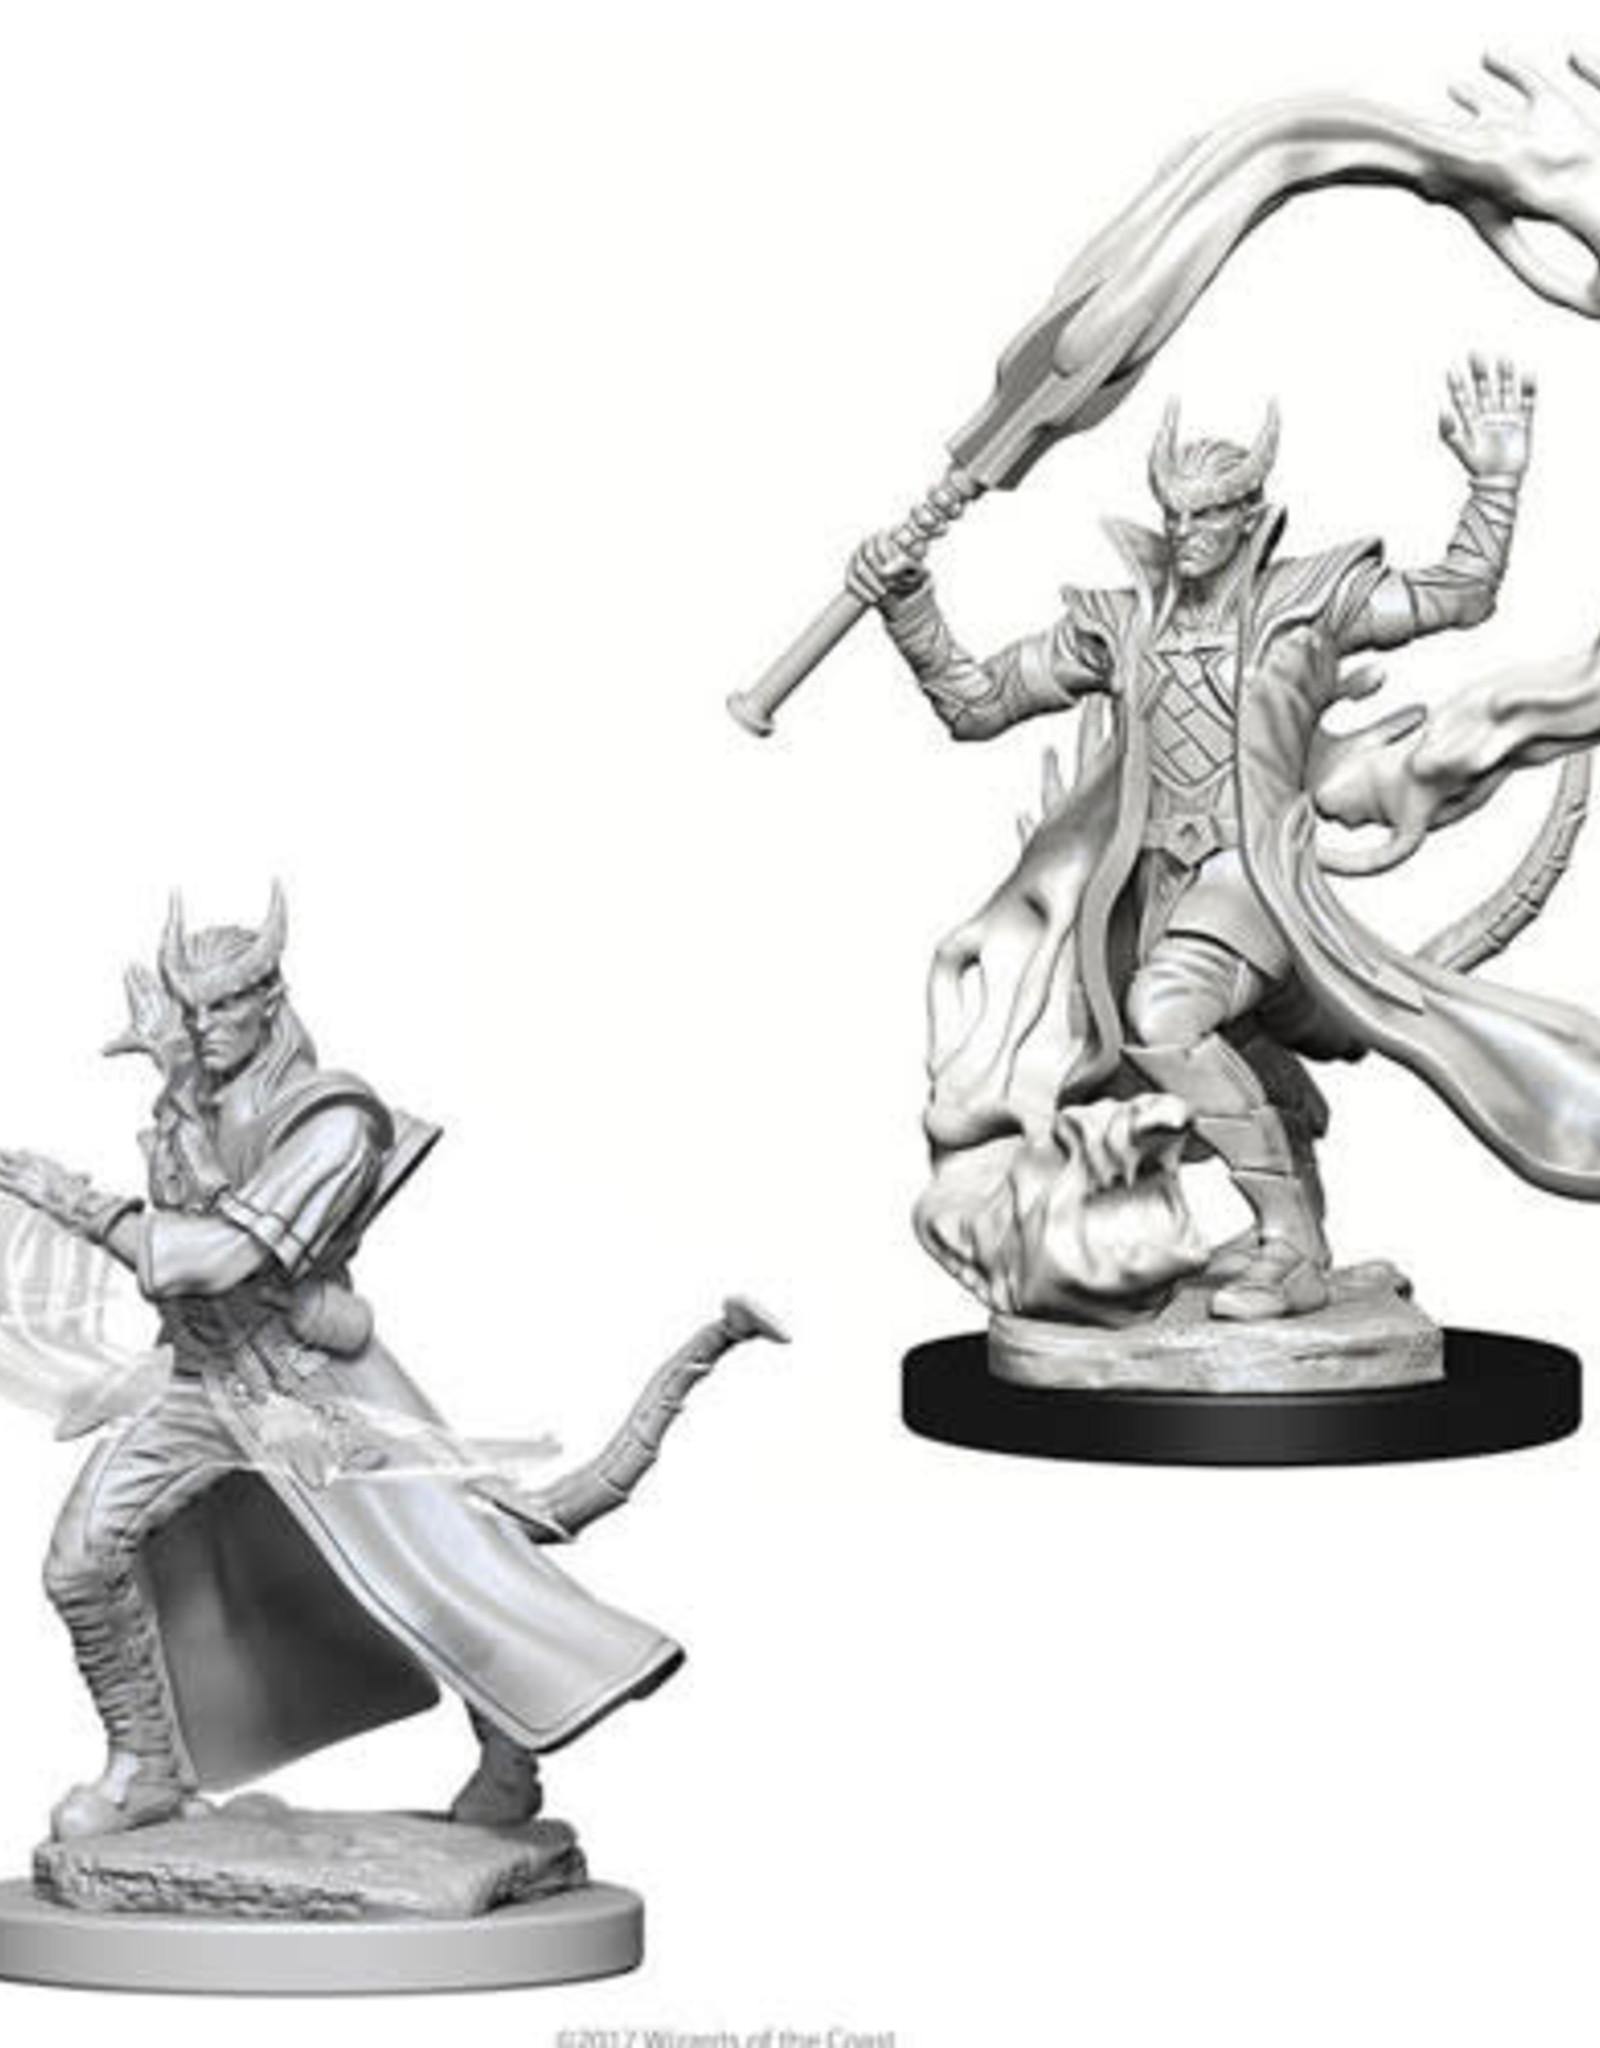 WizKids D&D Nolzur Tiefling Sorcerer  (He/Him/They/Them)